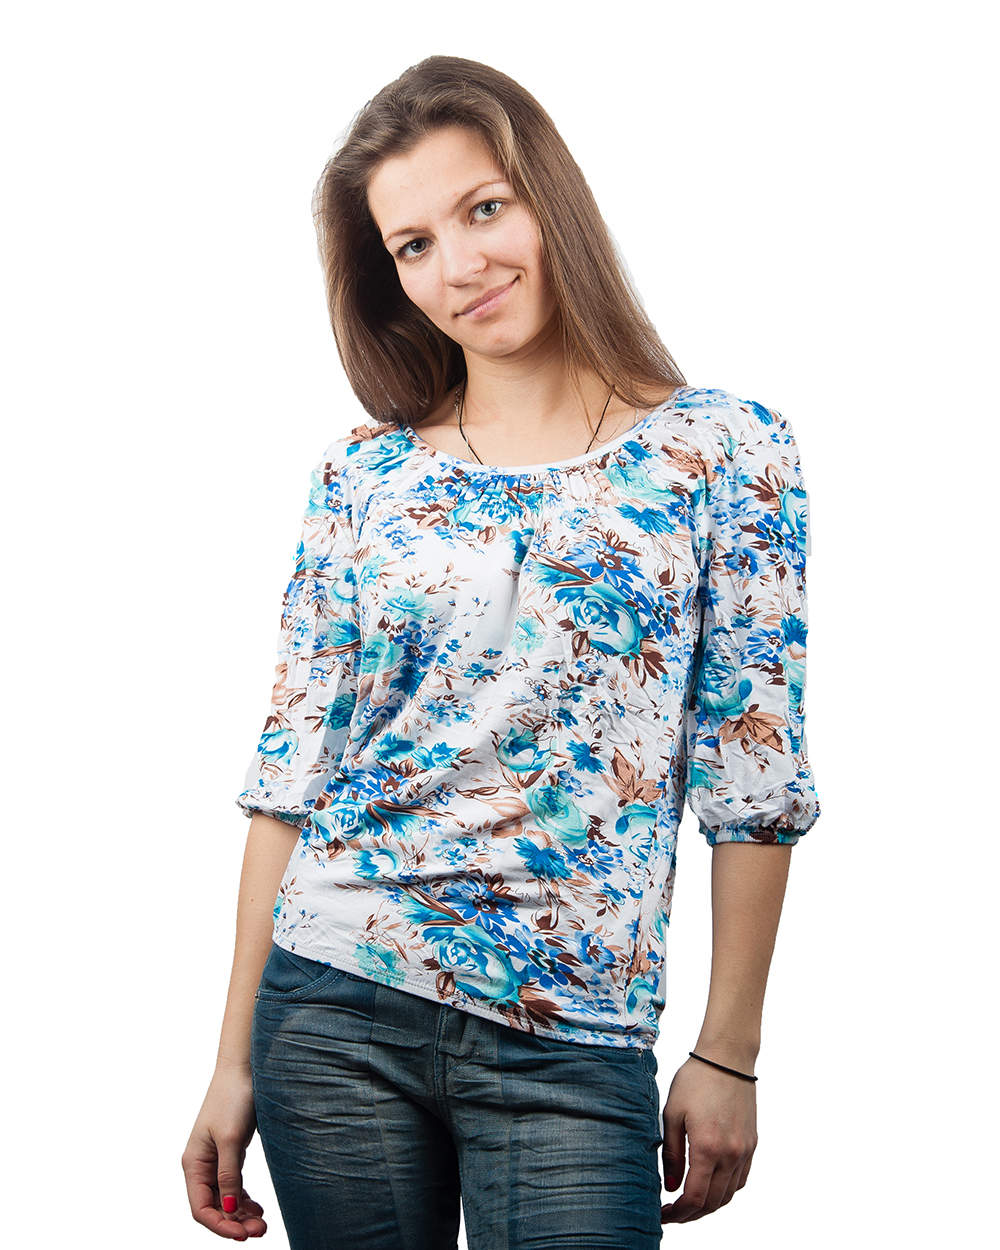 Голубая Блузка Фото В Новосибирске